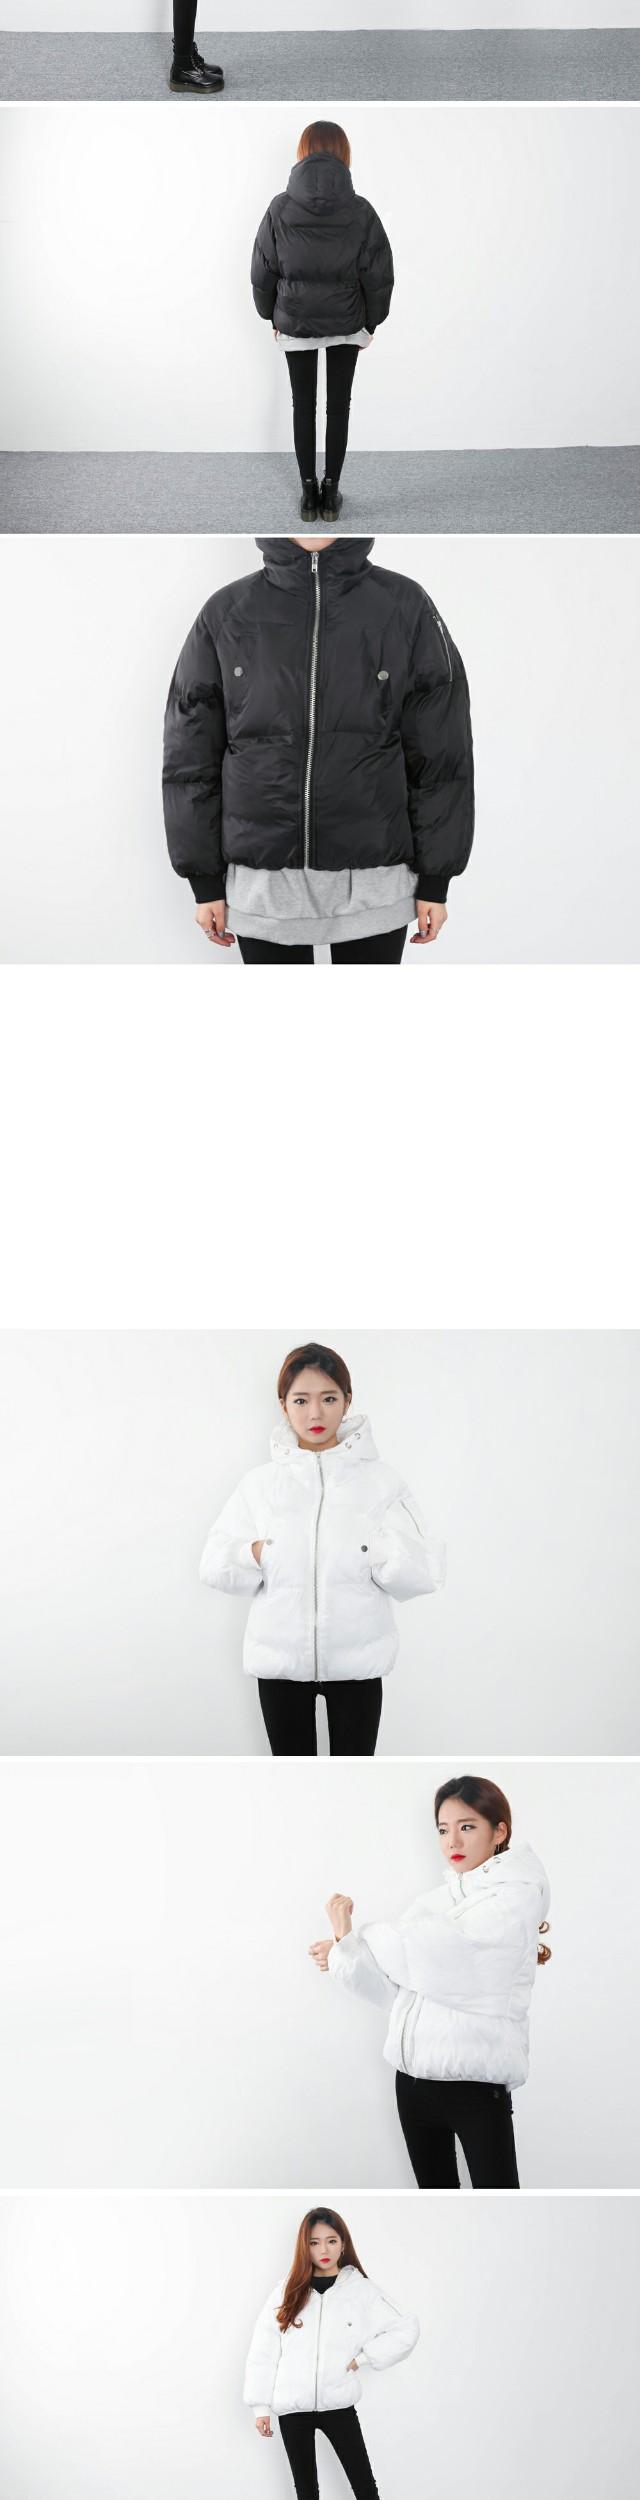 Loco hooded padding